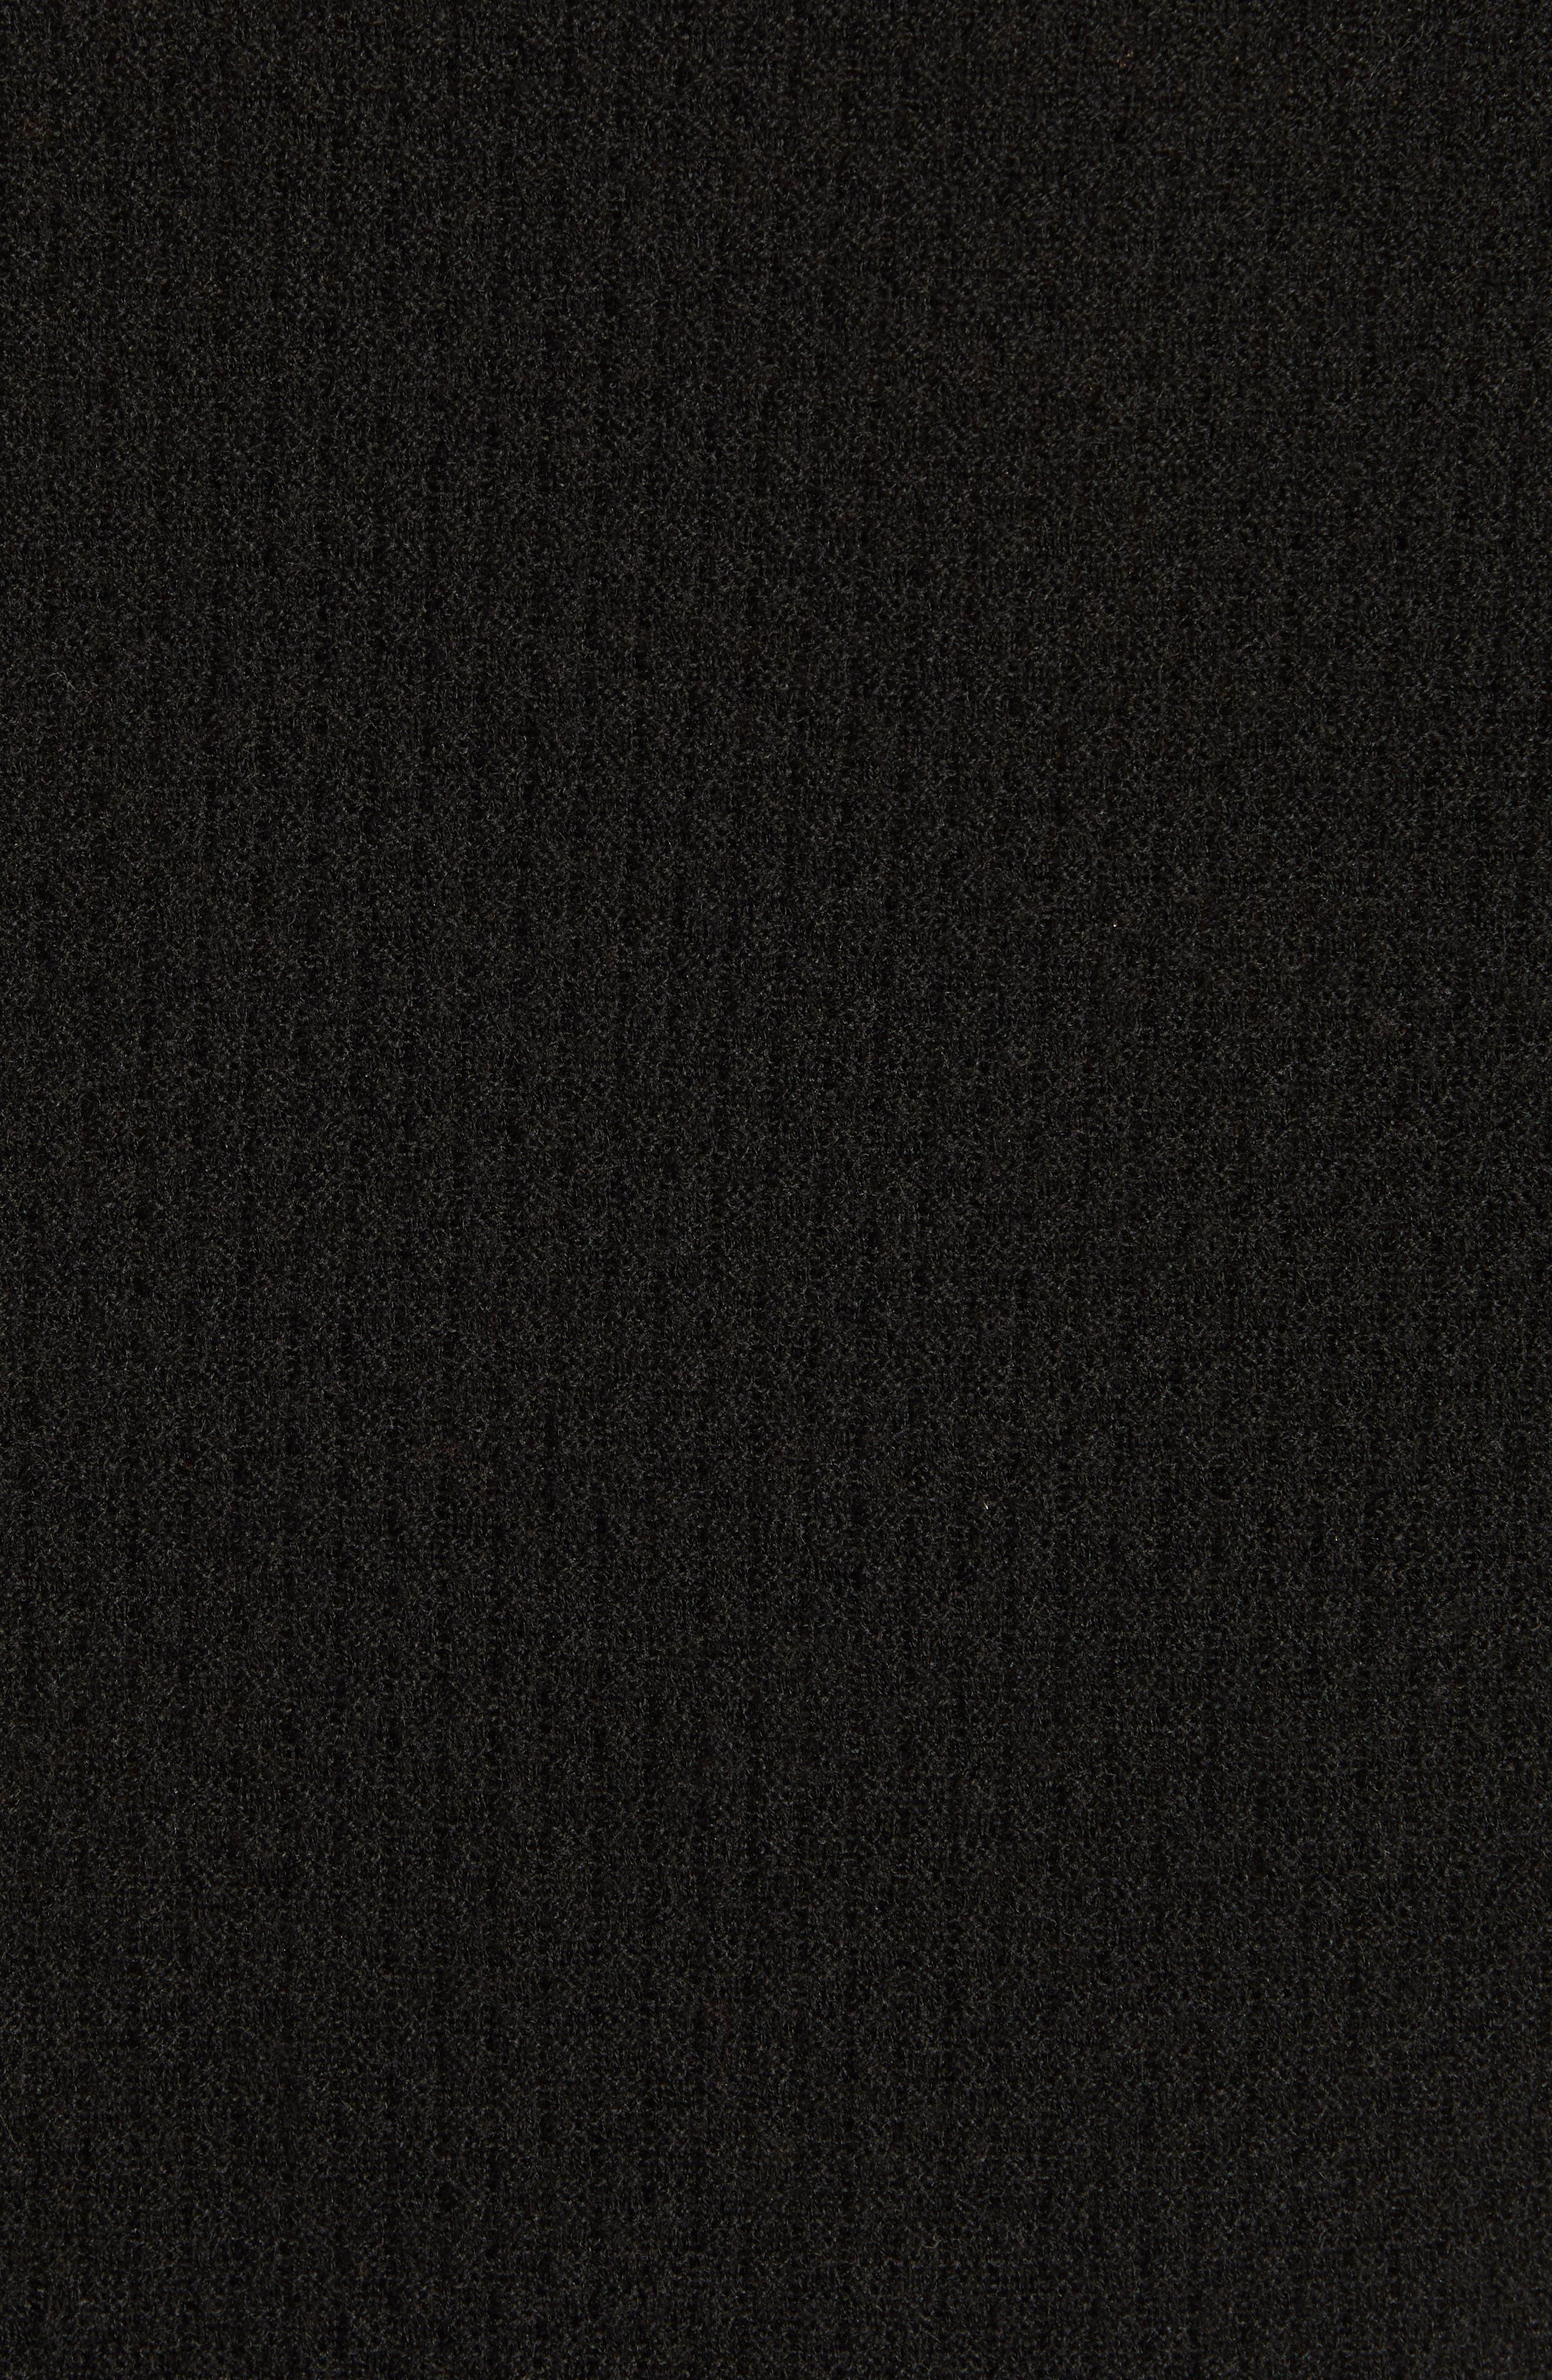 Capilene<sup>®</sup> Lightweight Air Crew Sweater,                             Alternate thumbnail 5, color,                             BLACK